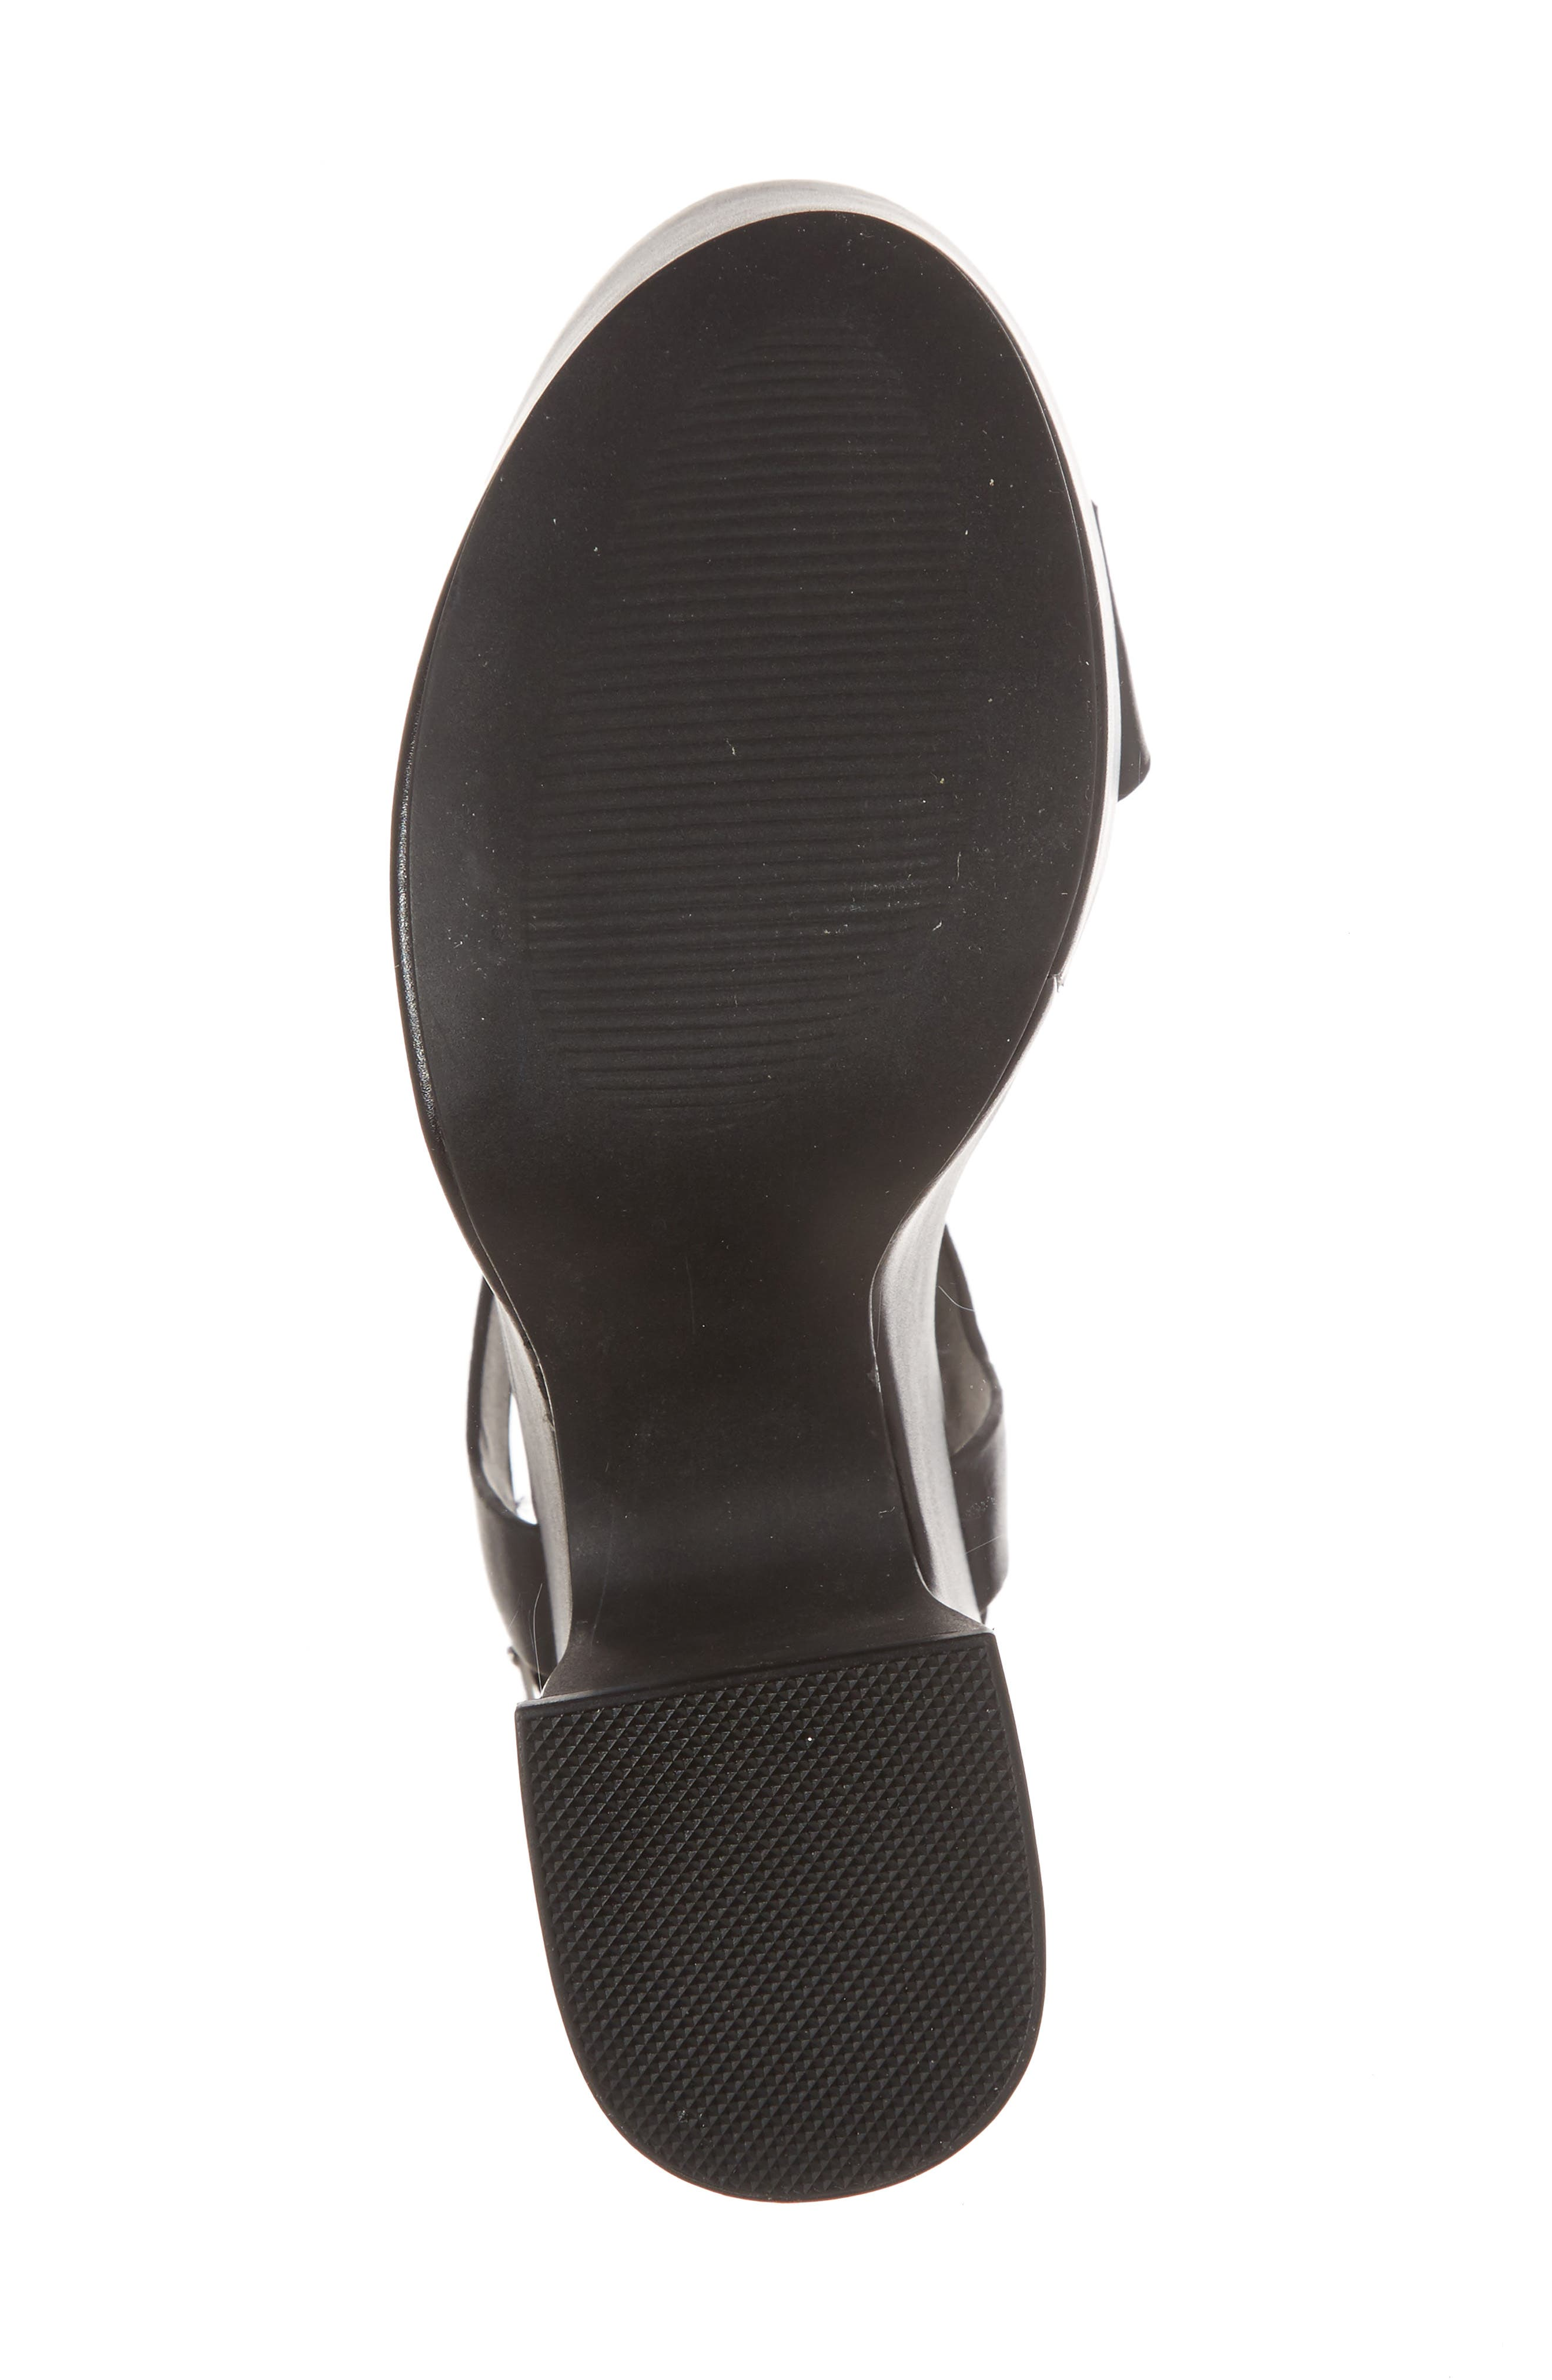 Advice Platform Sandal,                             Alternate thumbnail 6, color,                             Black Leather